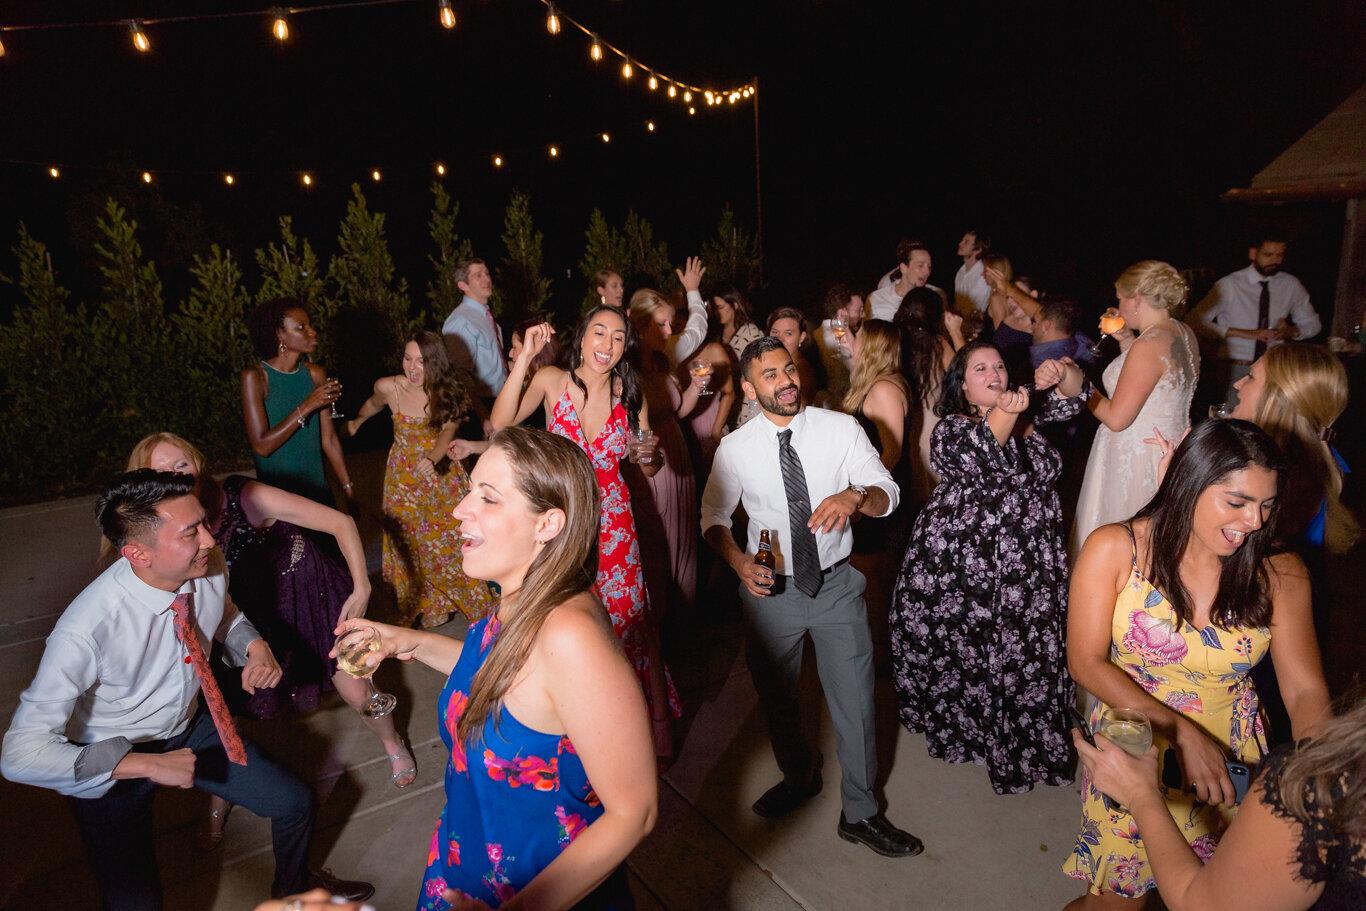 2019.08.24_Emily-Ashir-Wedding-at-the-Maples-6609.jpg